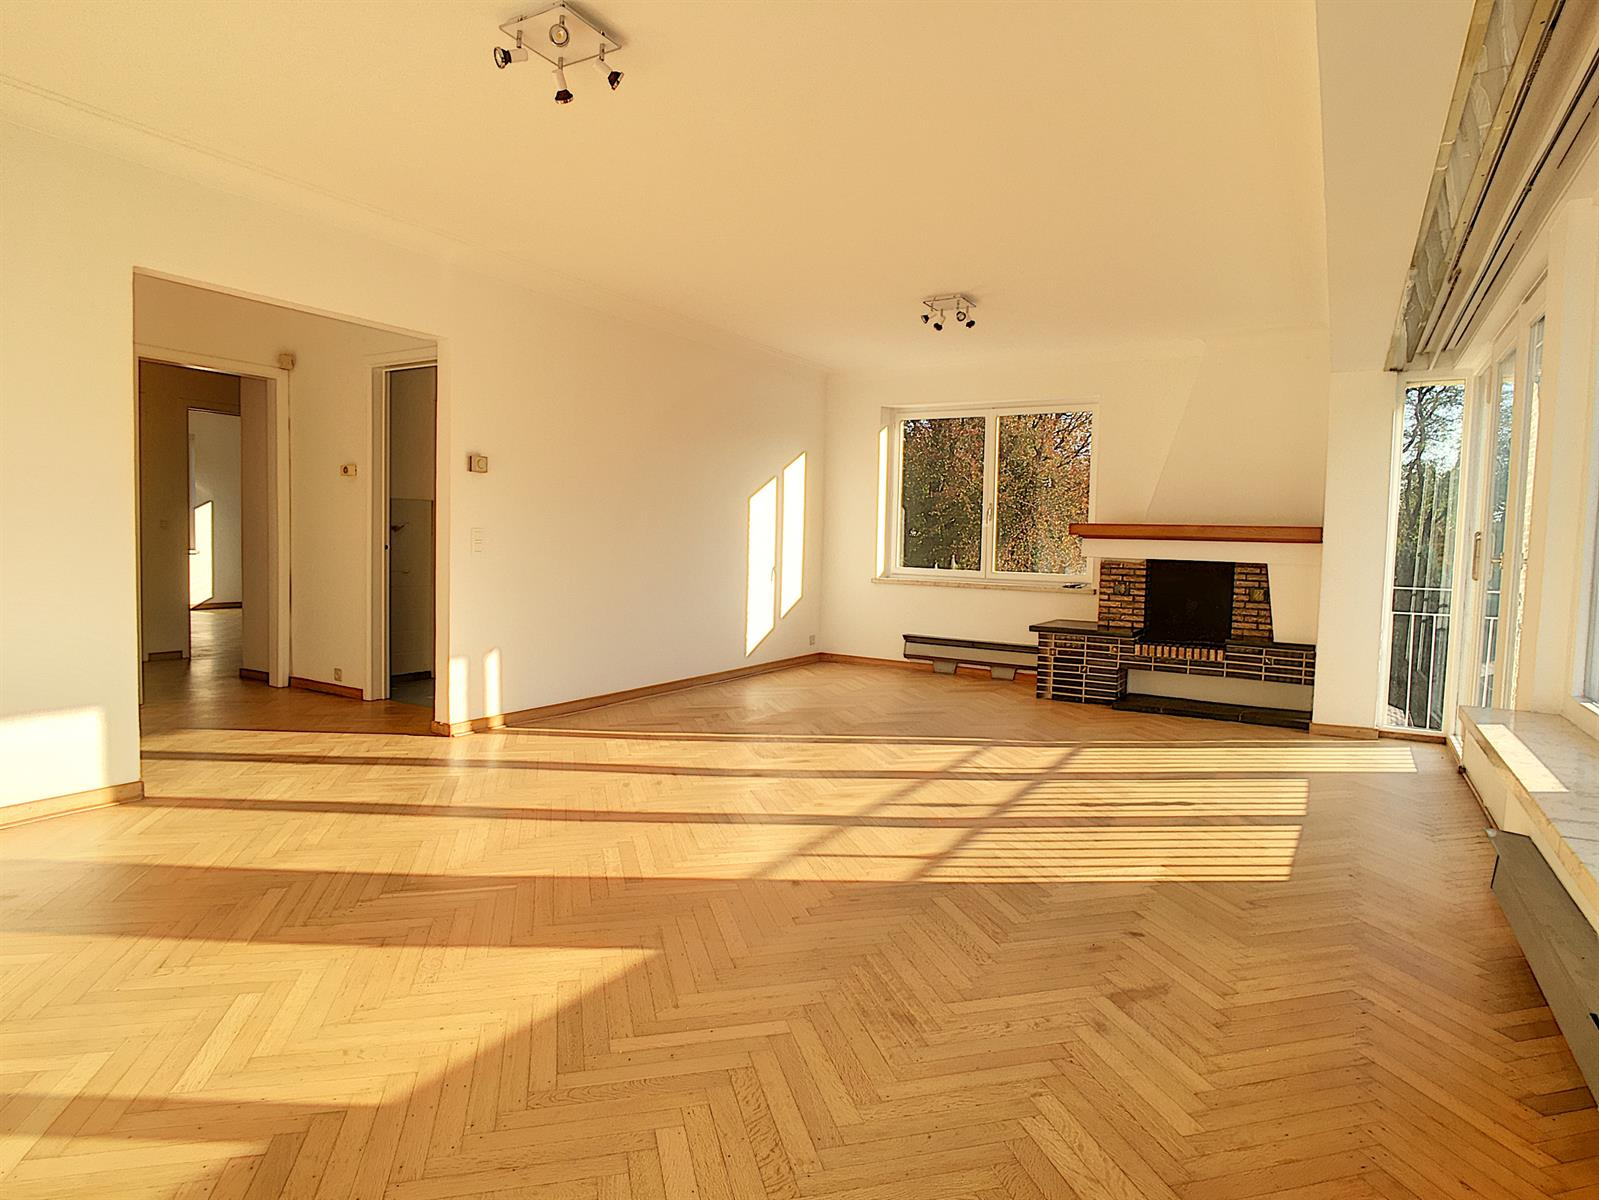 Flat - Auderghem - #4197560-3